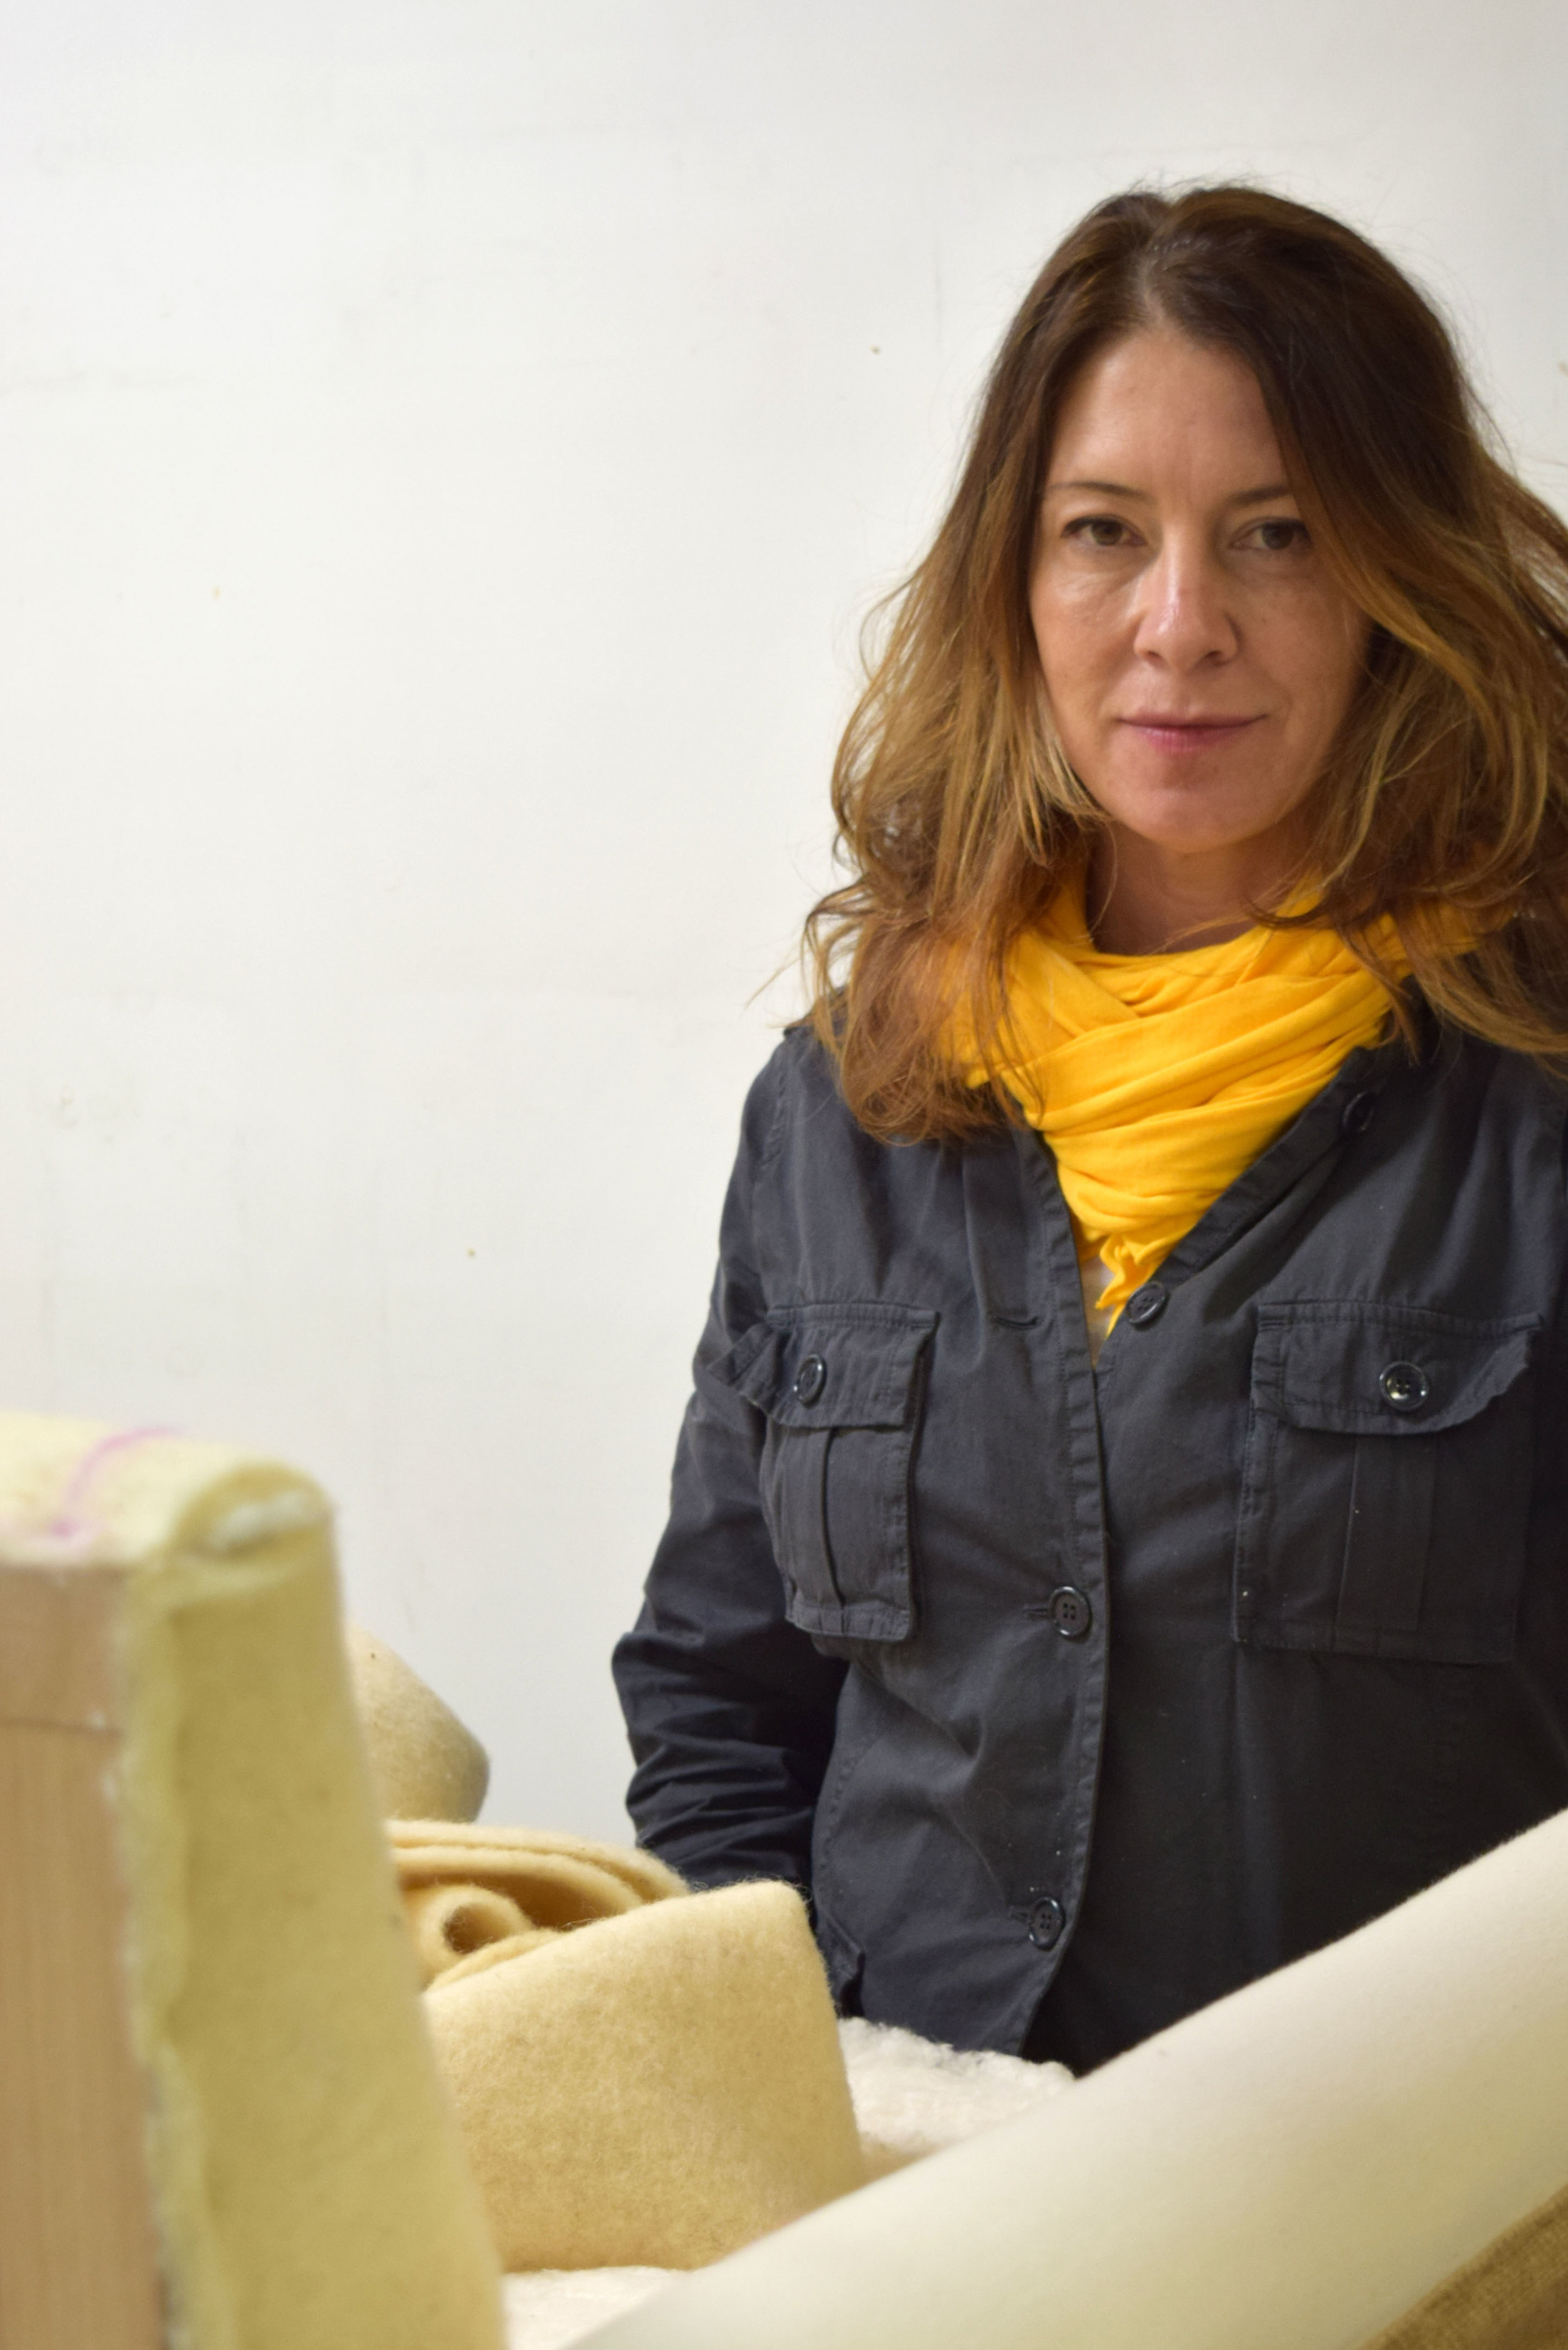 EcoBalanza Founder and CEO, Aimee Robinson